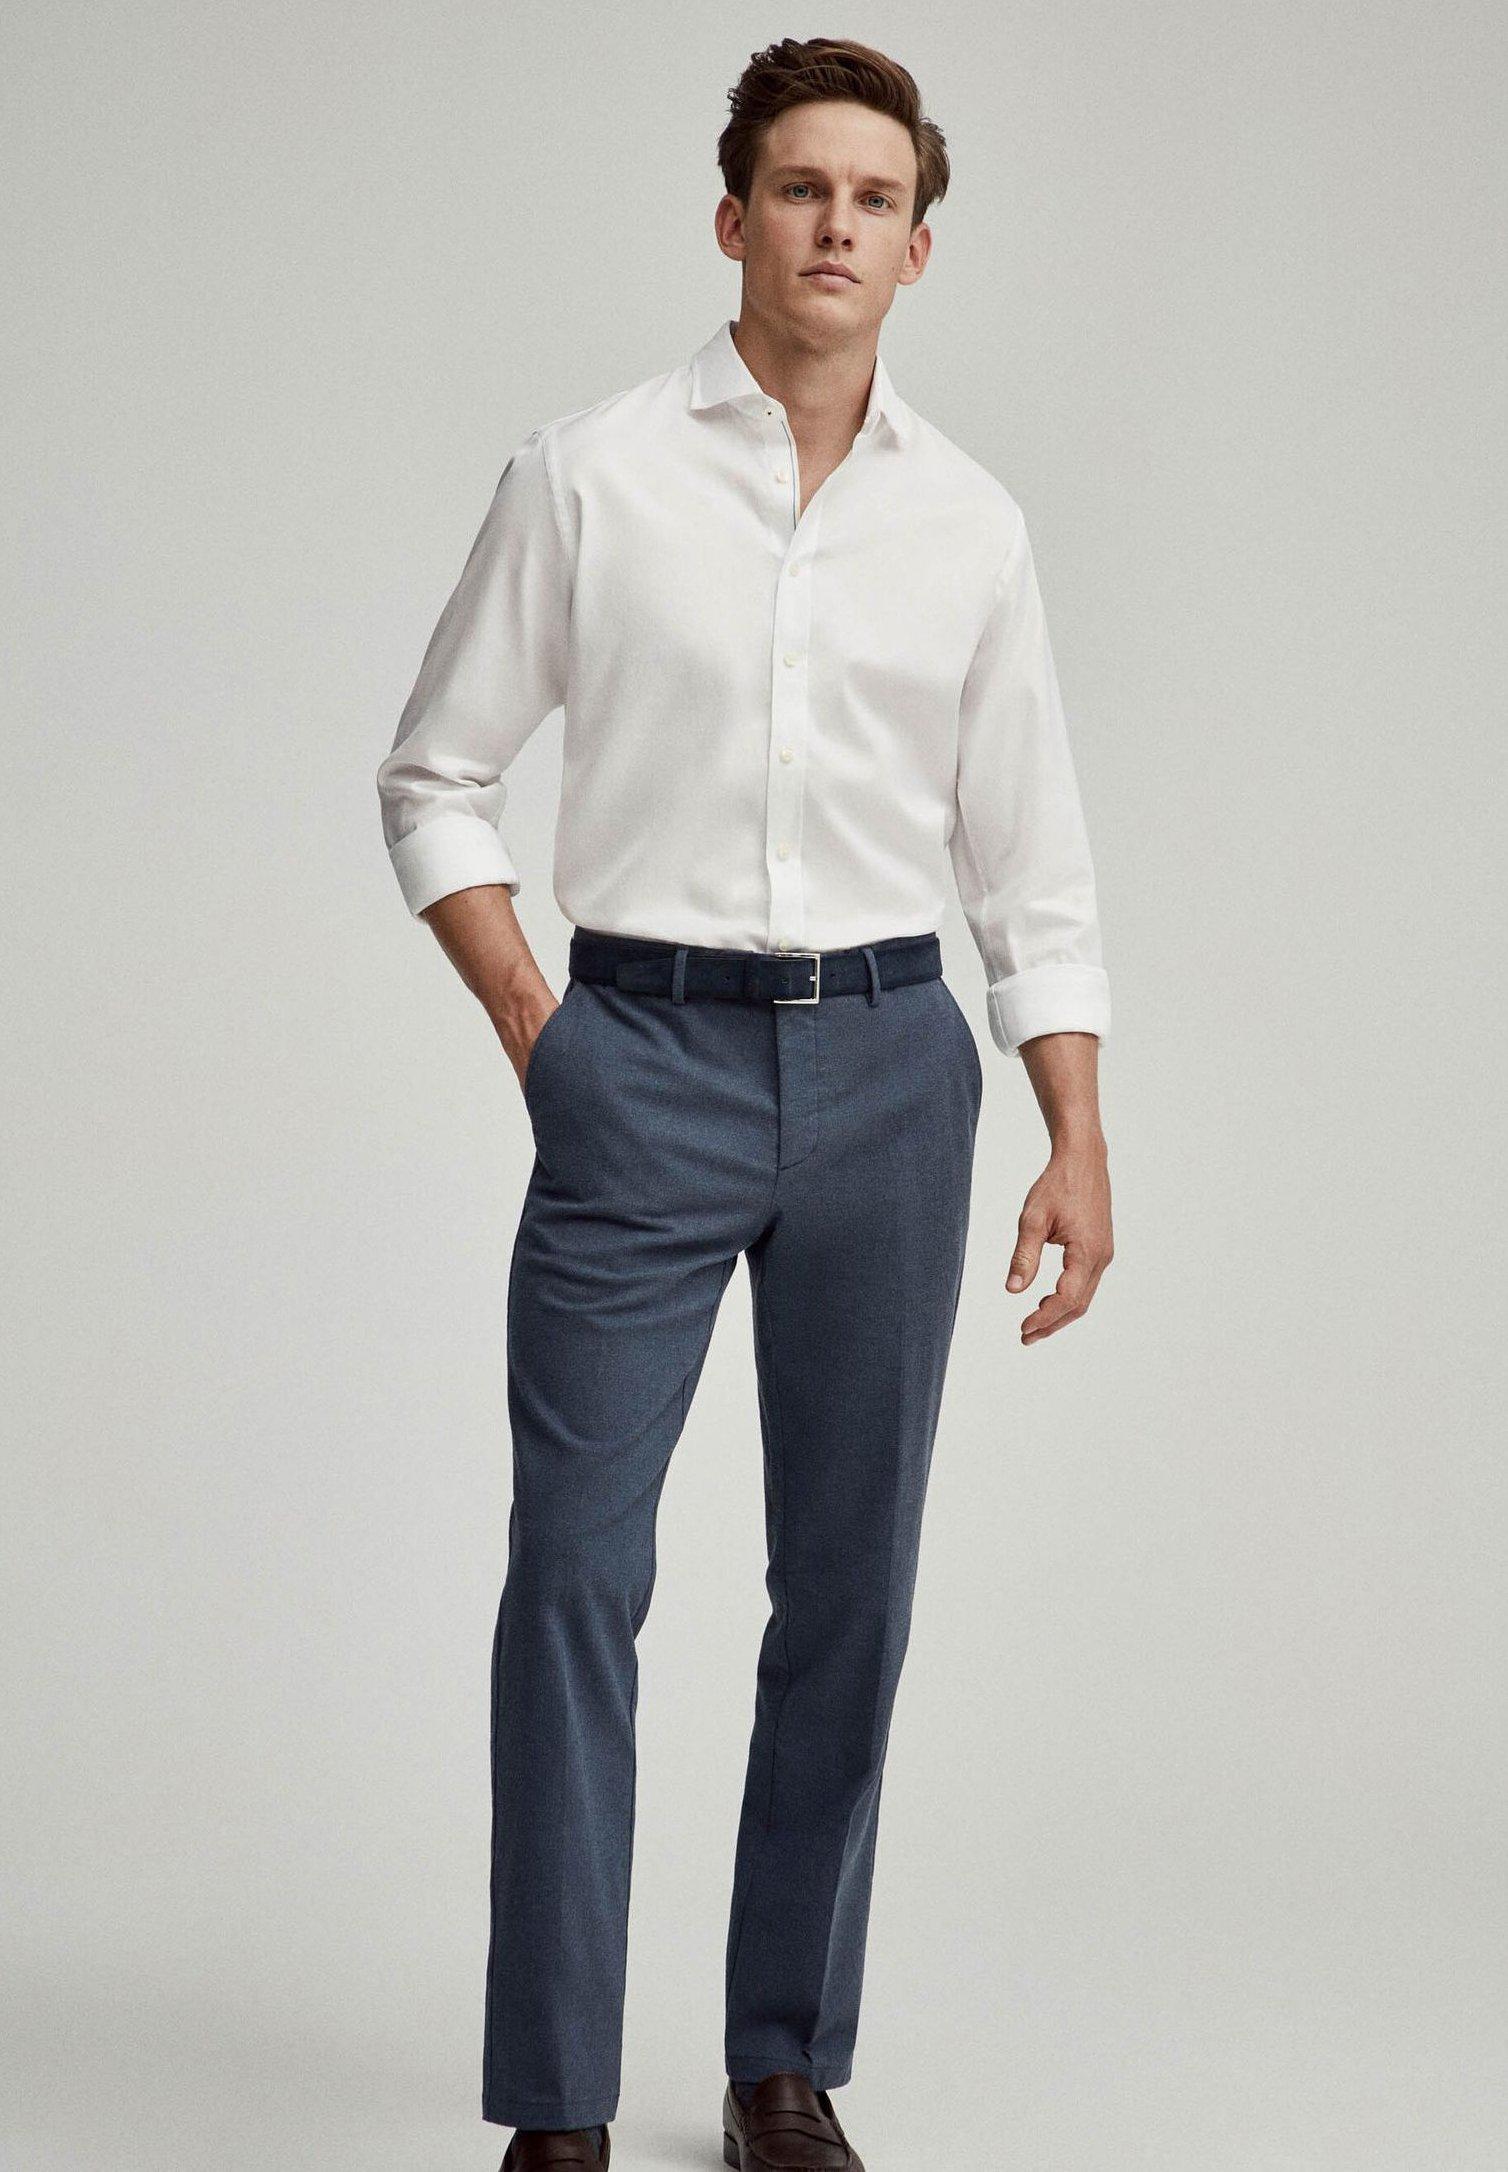 Hackett London Wht Trevi Engneerd Str - Shirt White